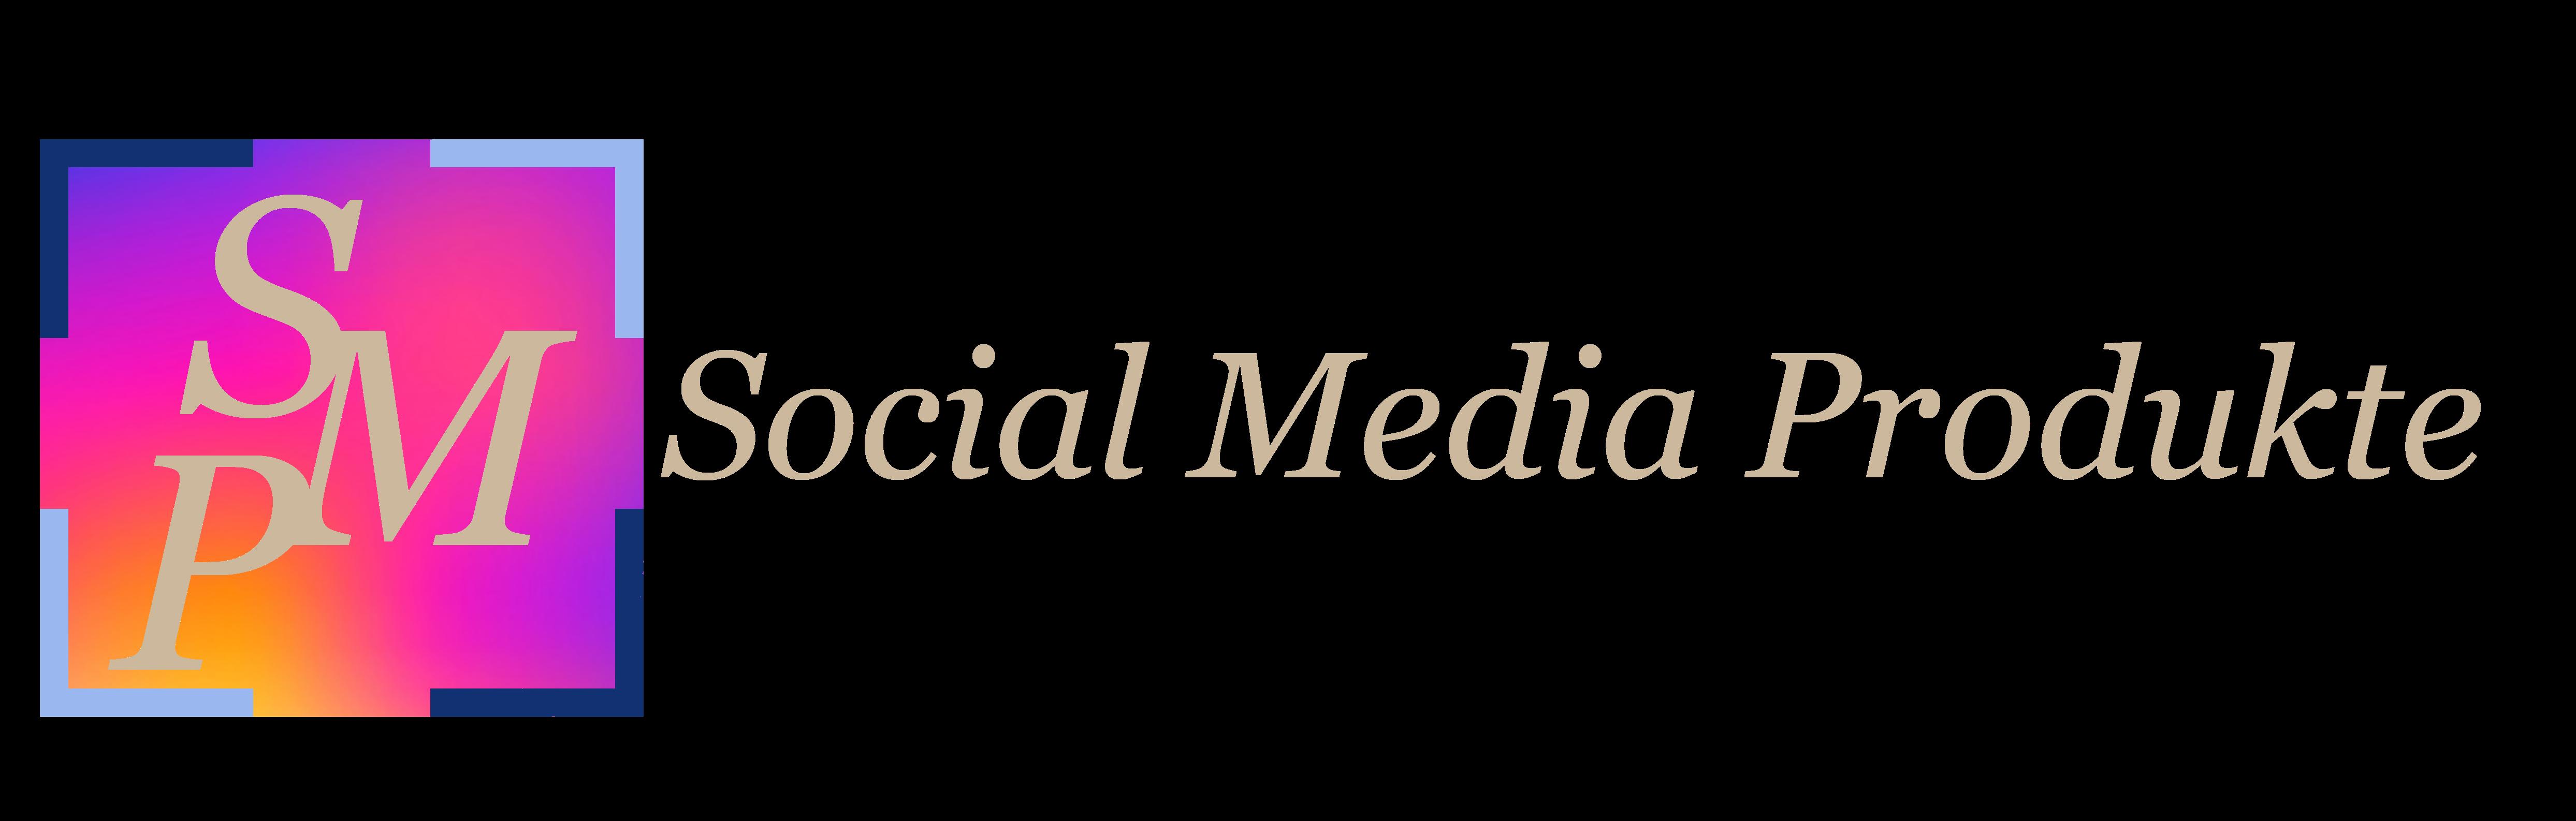 Social Media Produkte